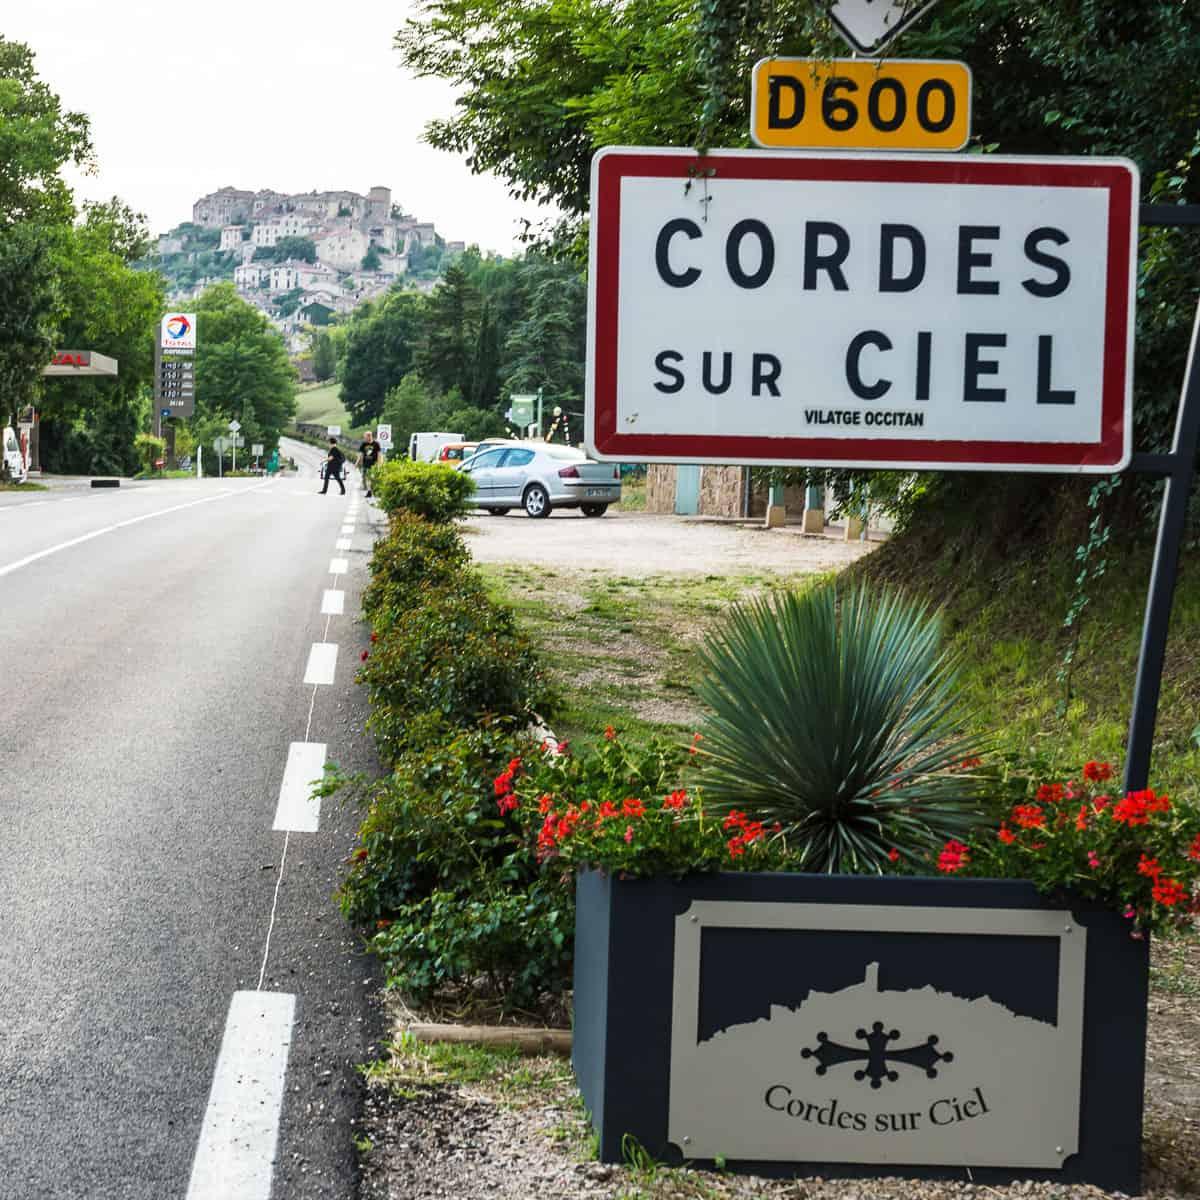 Cordes-sur-ciel-001.jpg